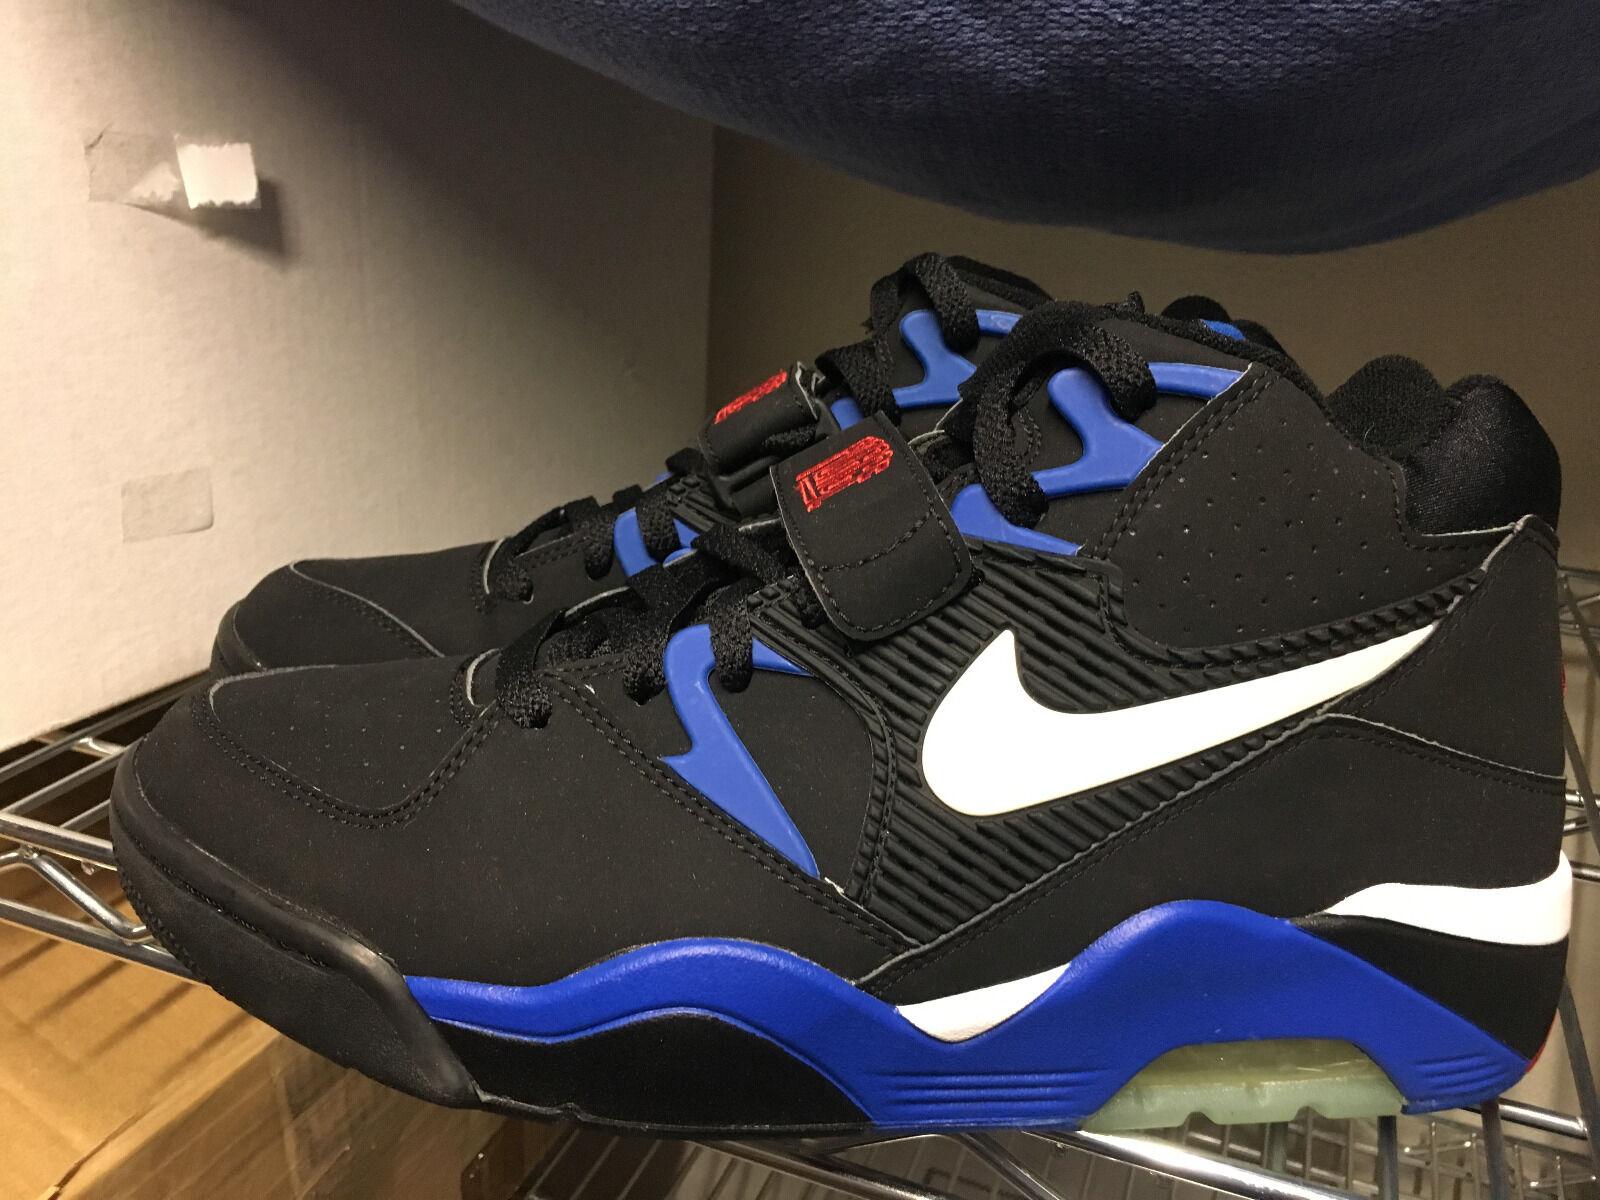 Nike Air Force 180 Charles Barkley size 11.5 NIB